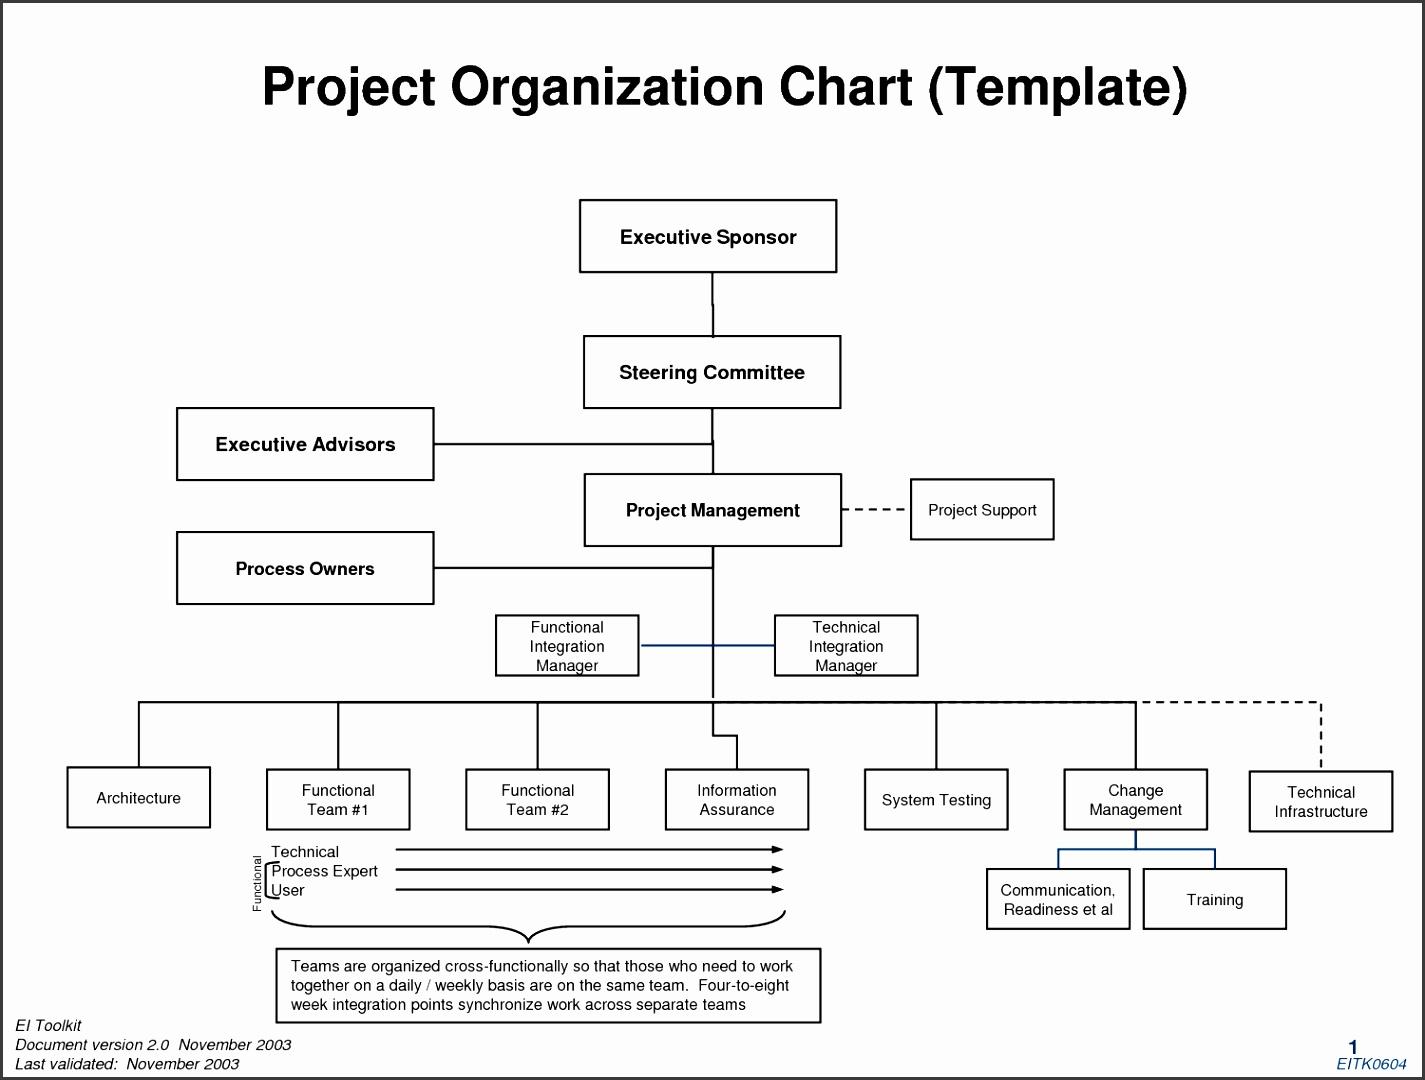 Project Organization Chart Template